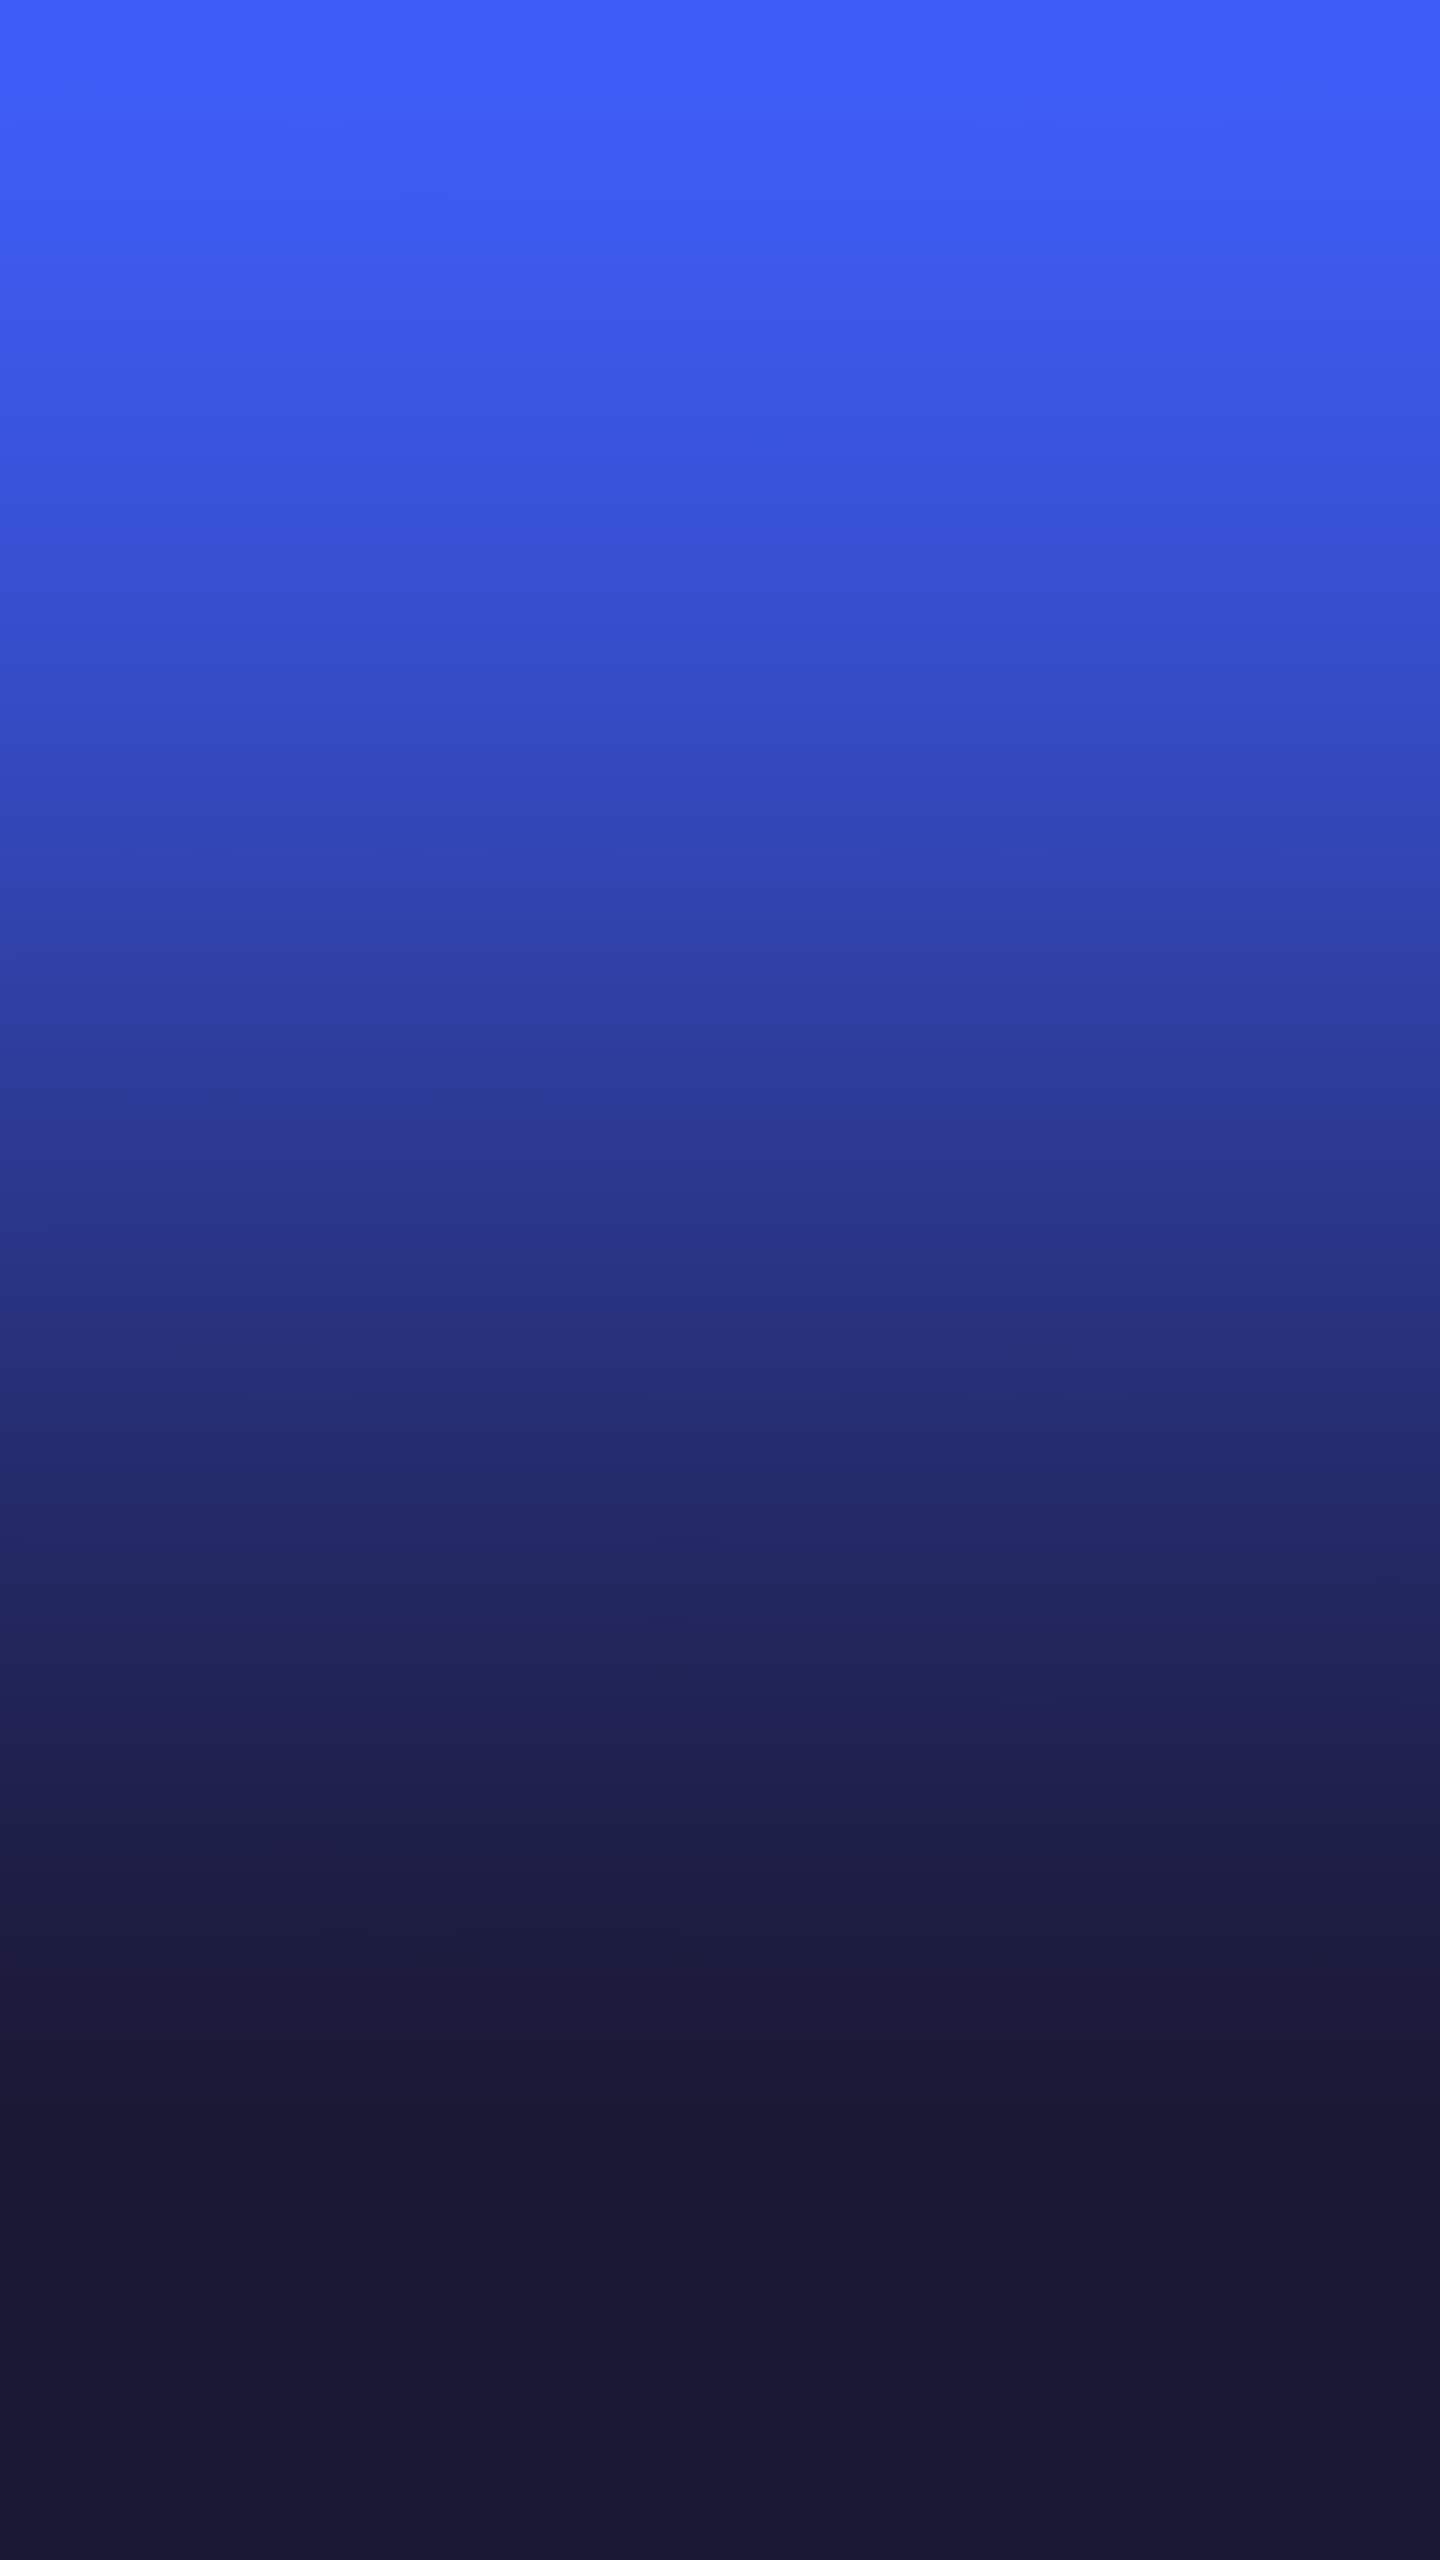 galaxy_s8_gradient_droidviews